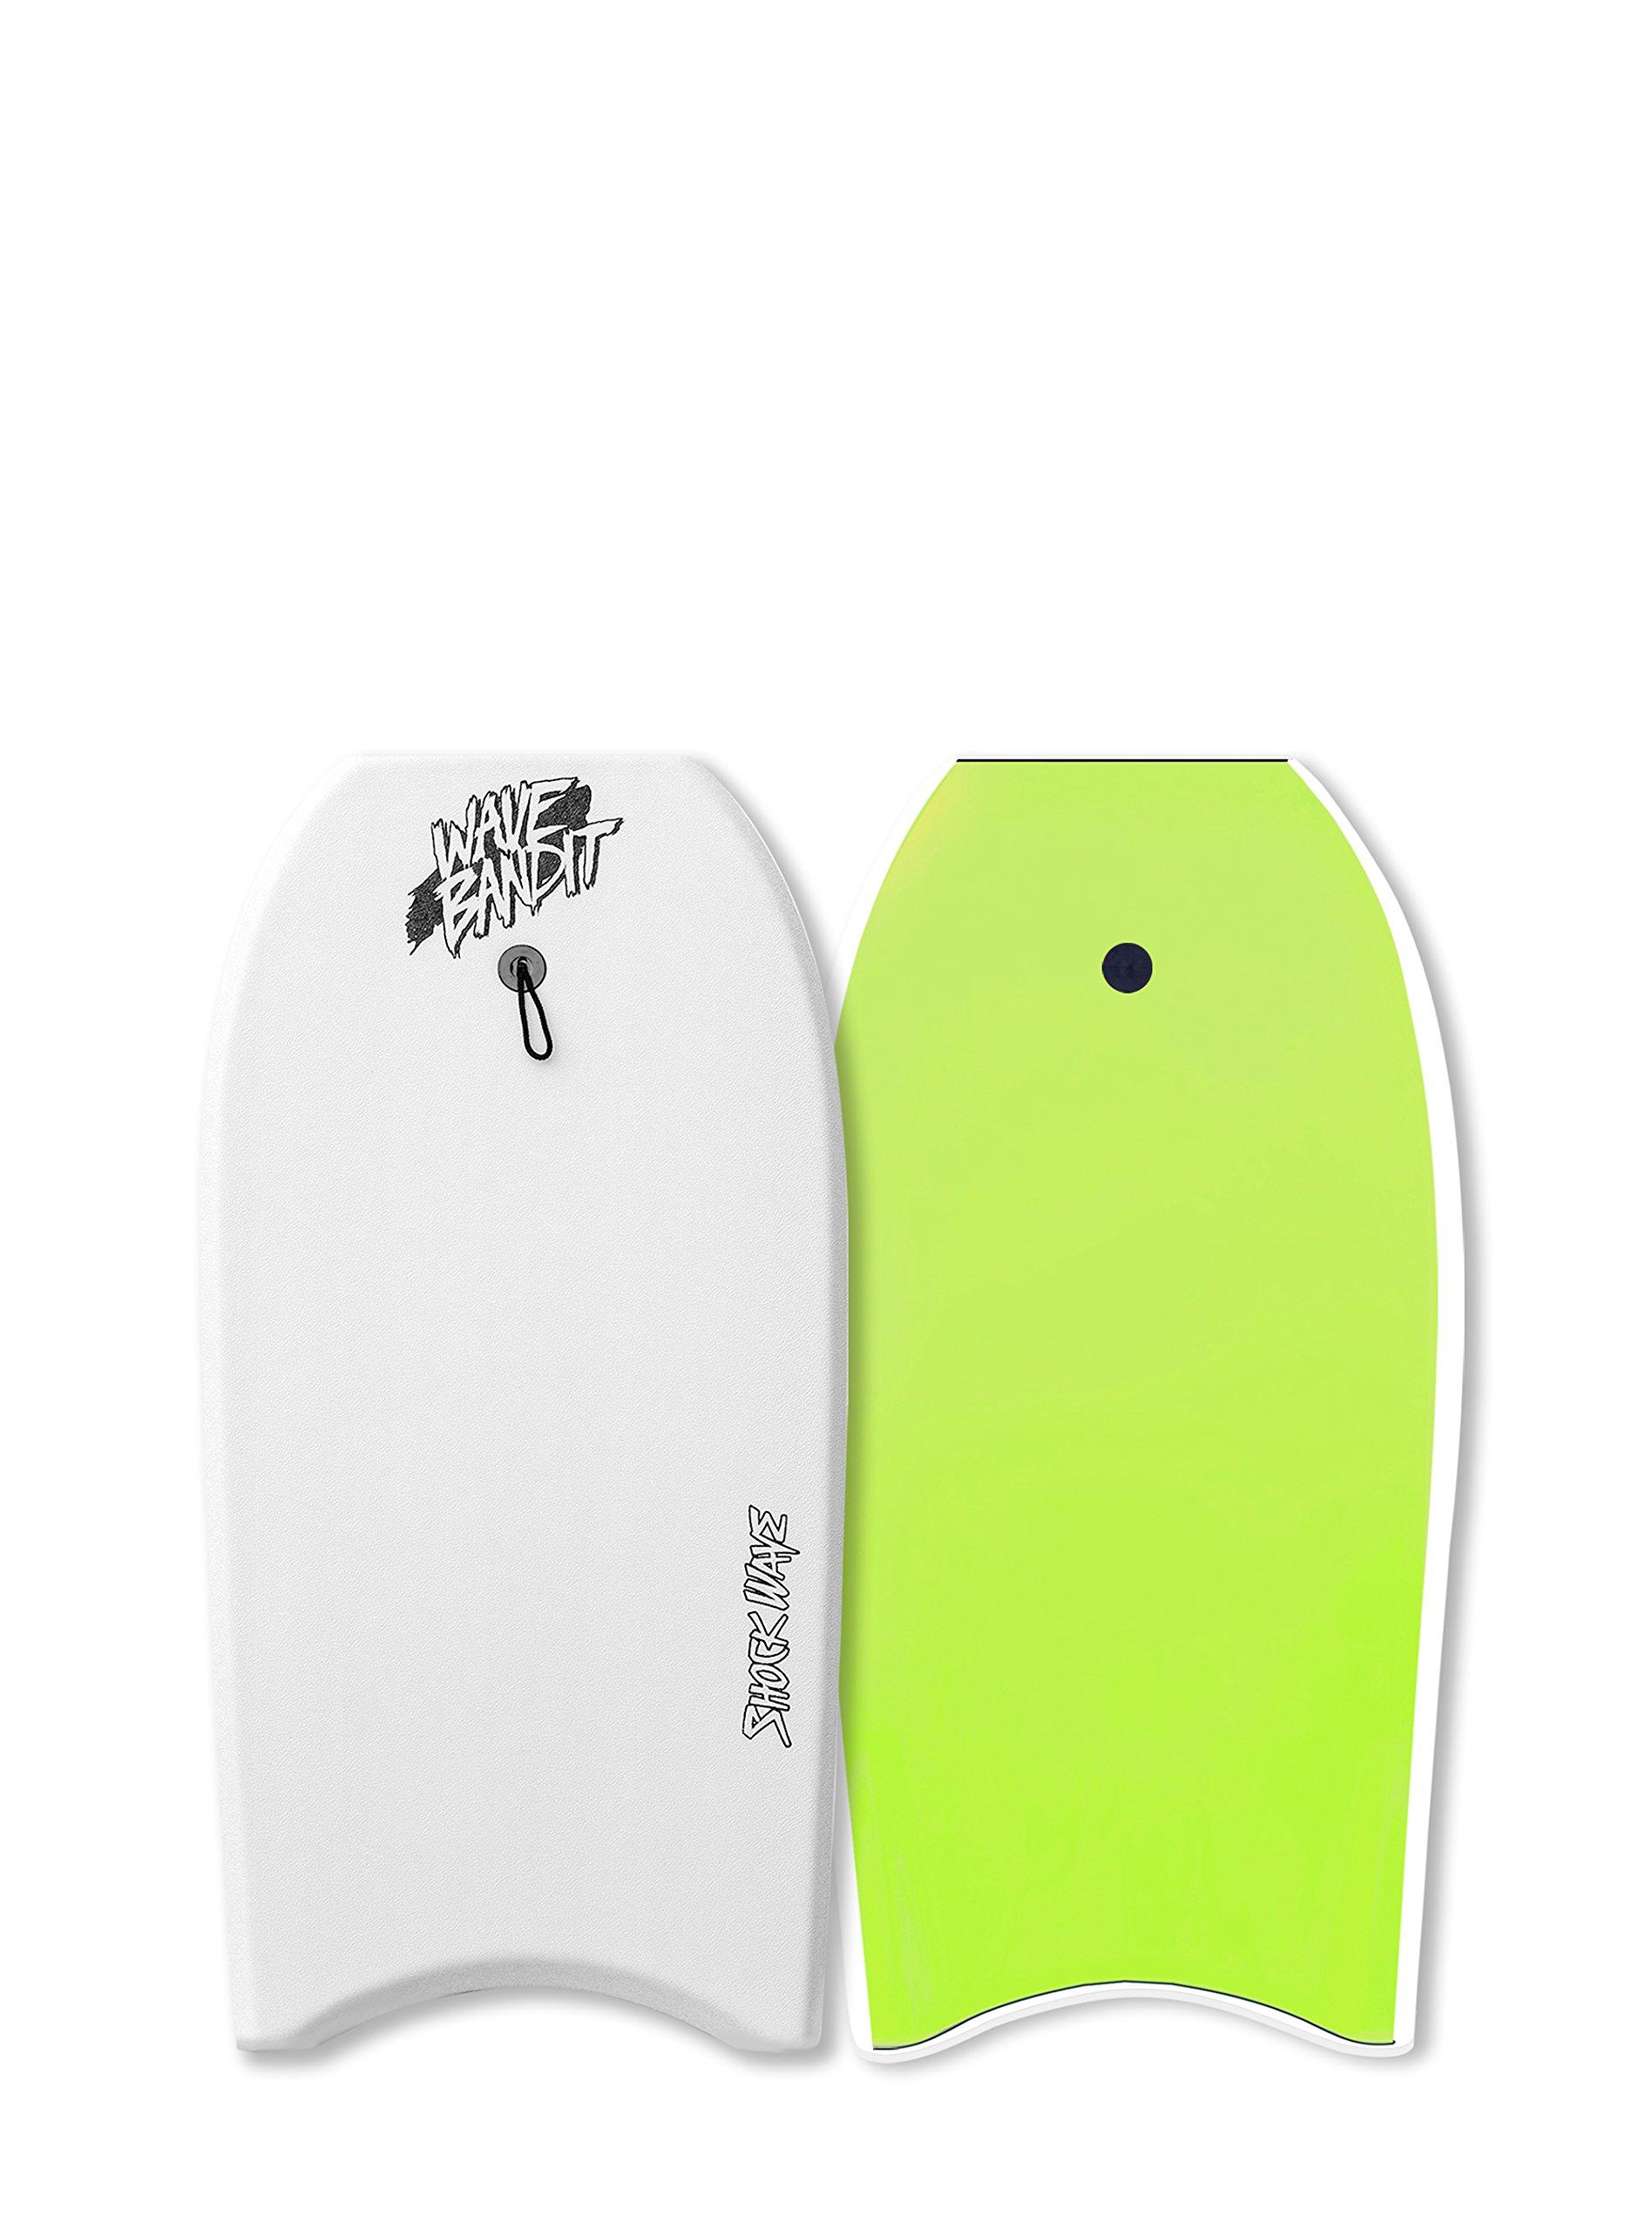 Catch Surf Wave Bandit Shockwave 36'' Body Board, White by Catch Surf